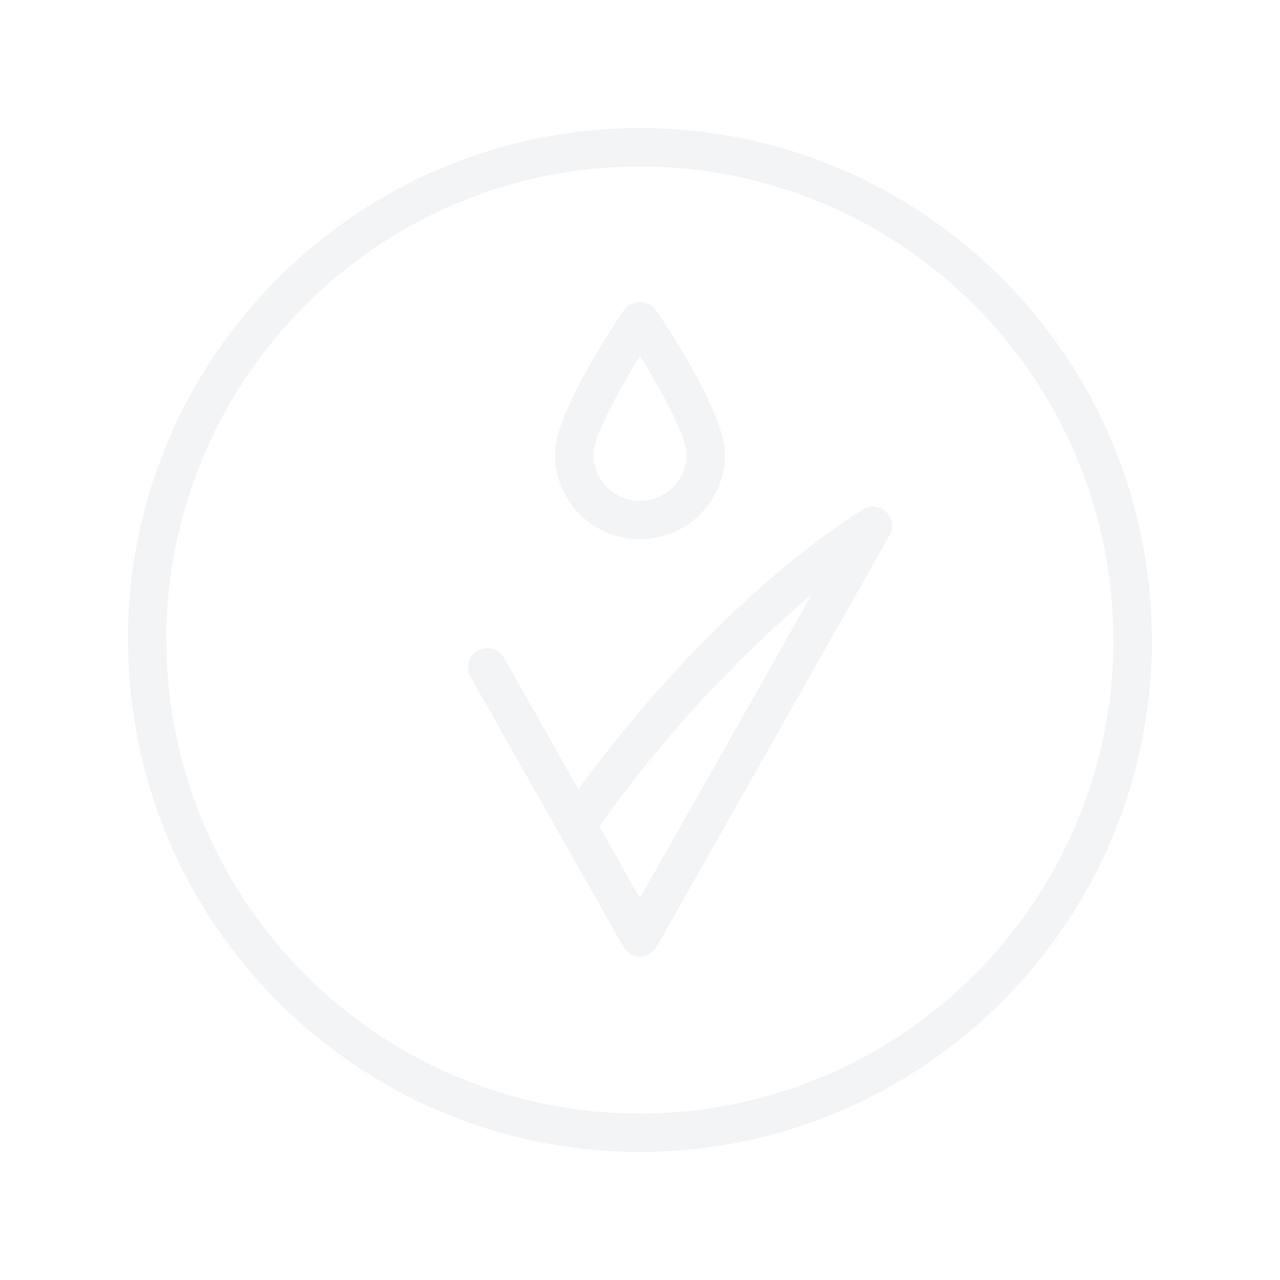 ARTDECO Eye Make-Up Remover Pads 60pcs